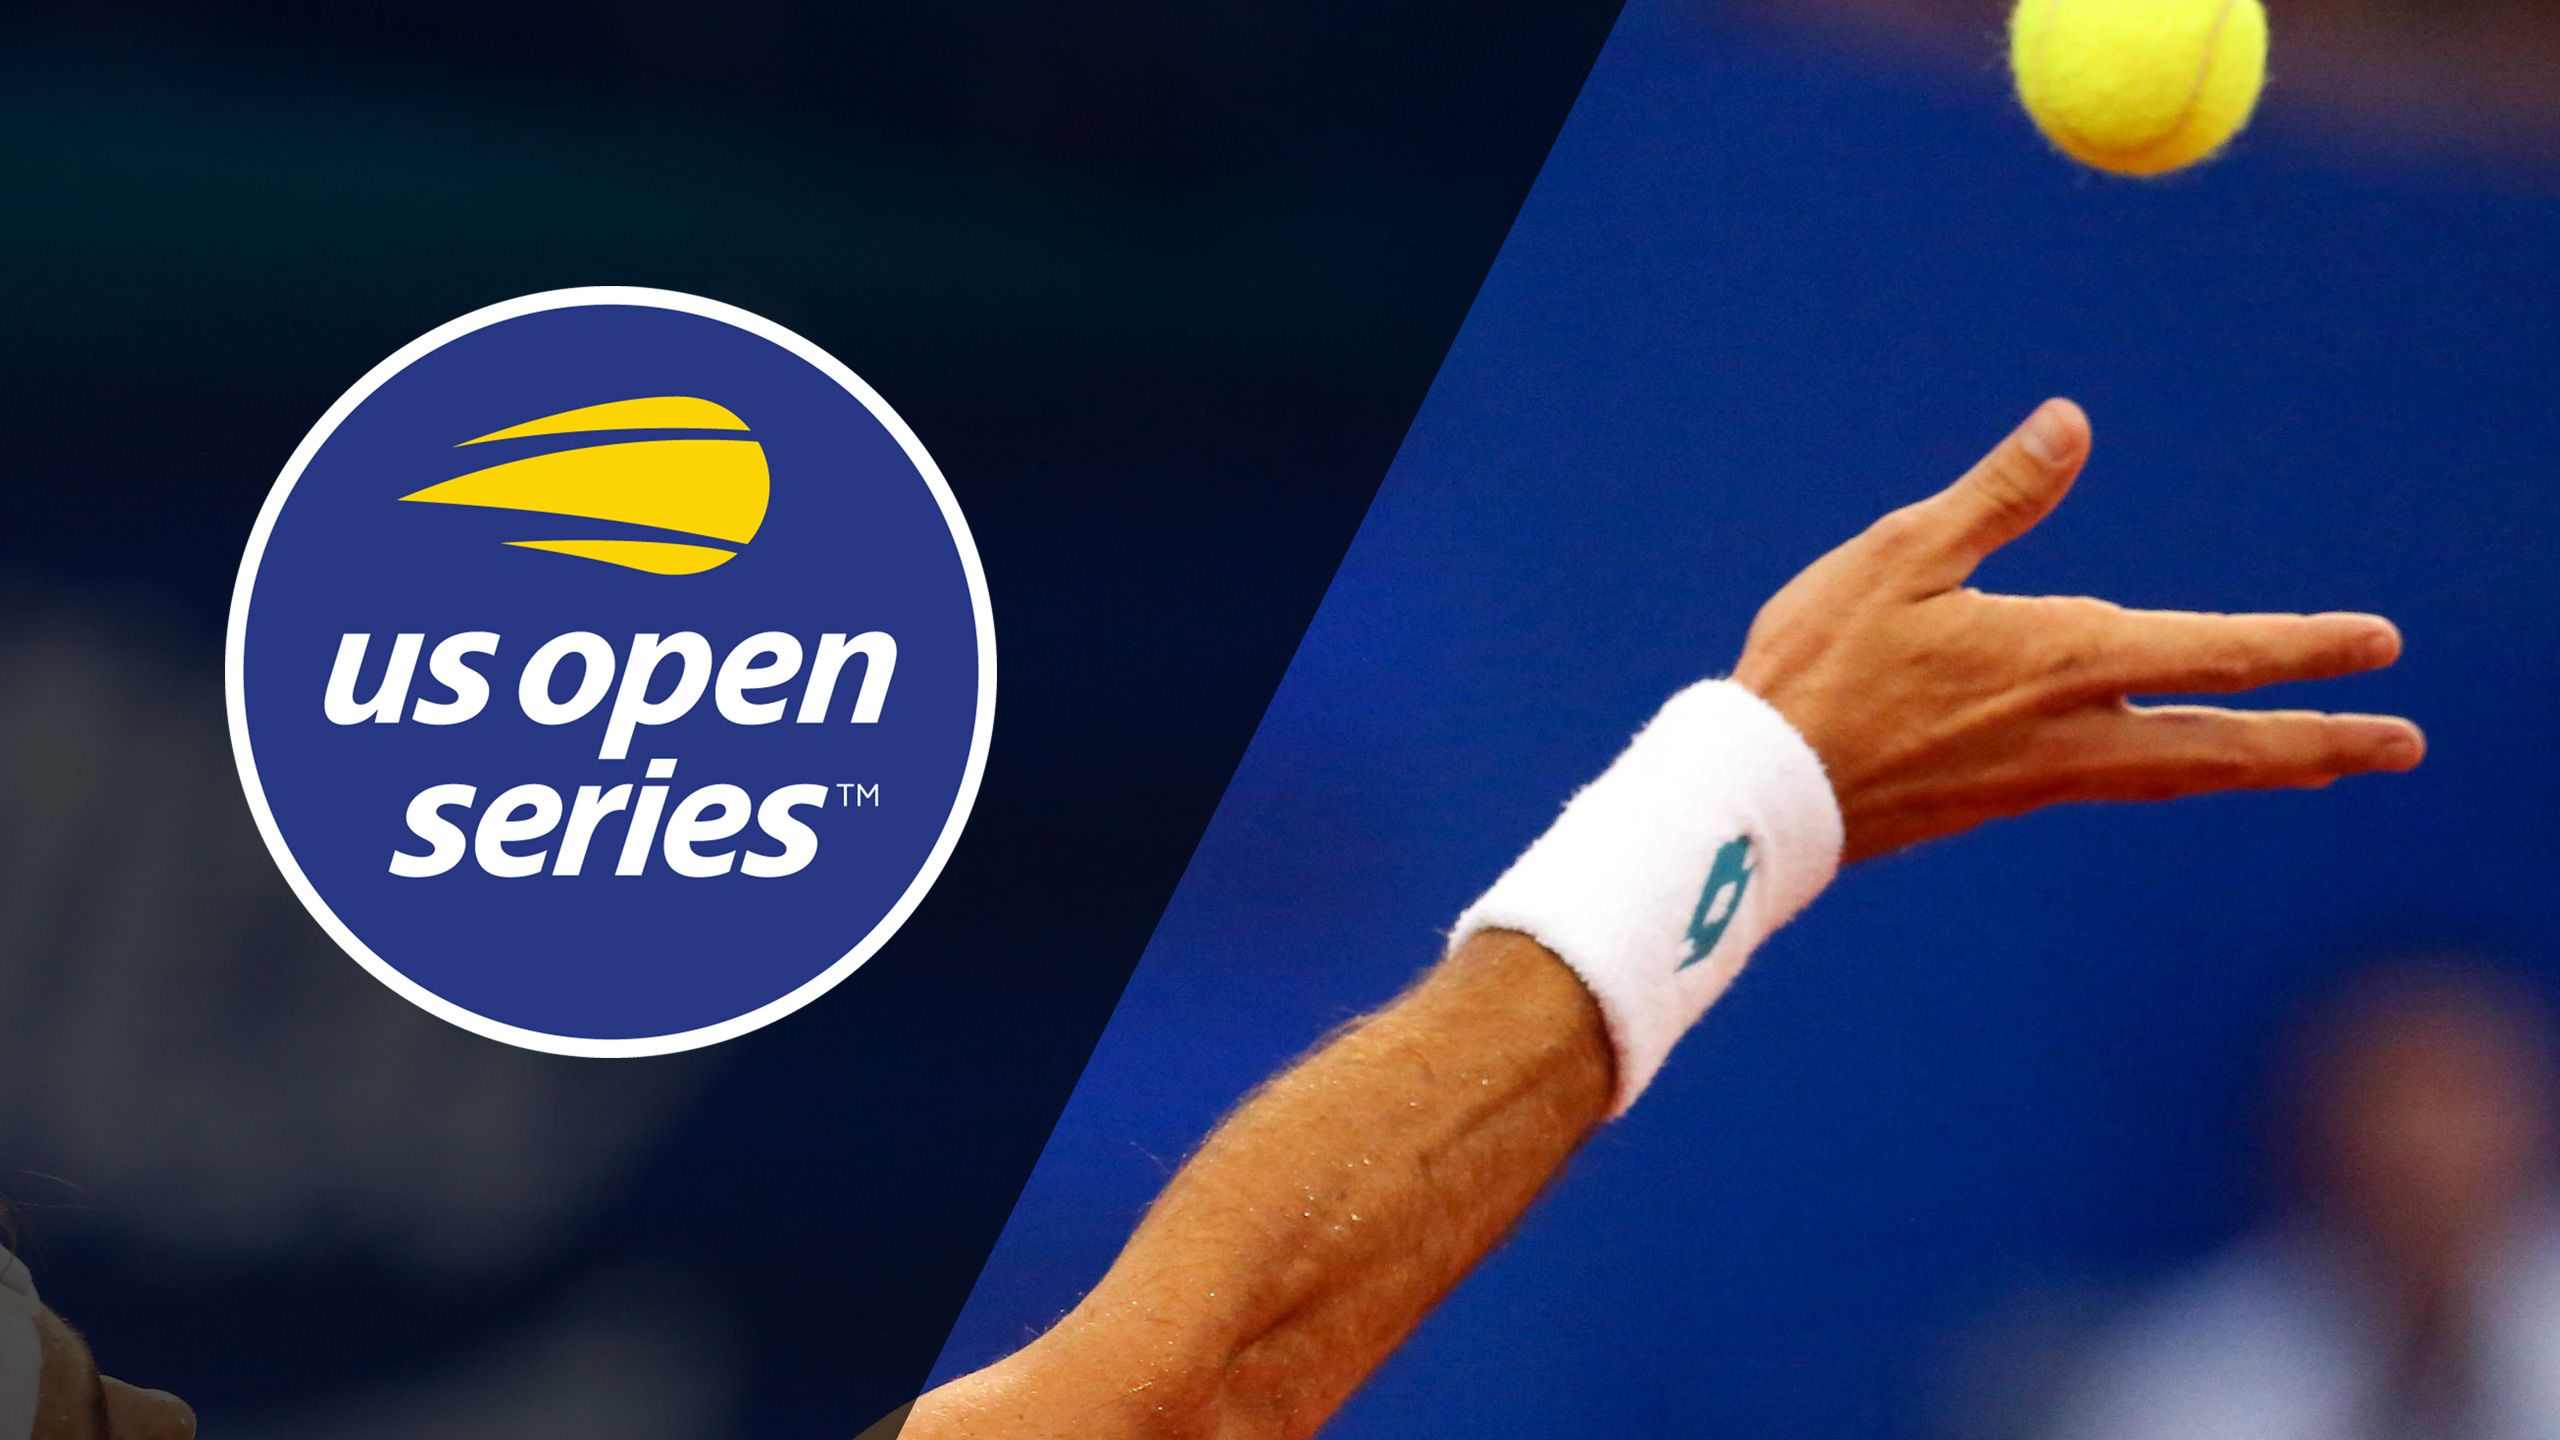 2018 US Open Series - BB&T Atlanta Open (Quarterfinal #4)